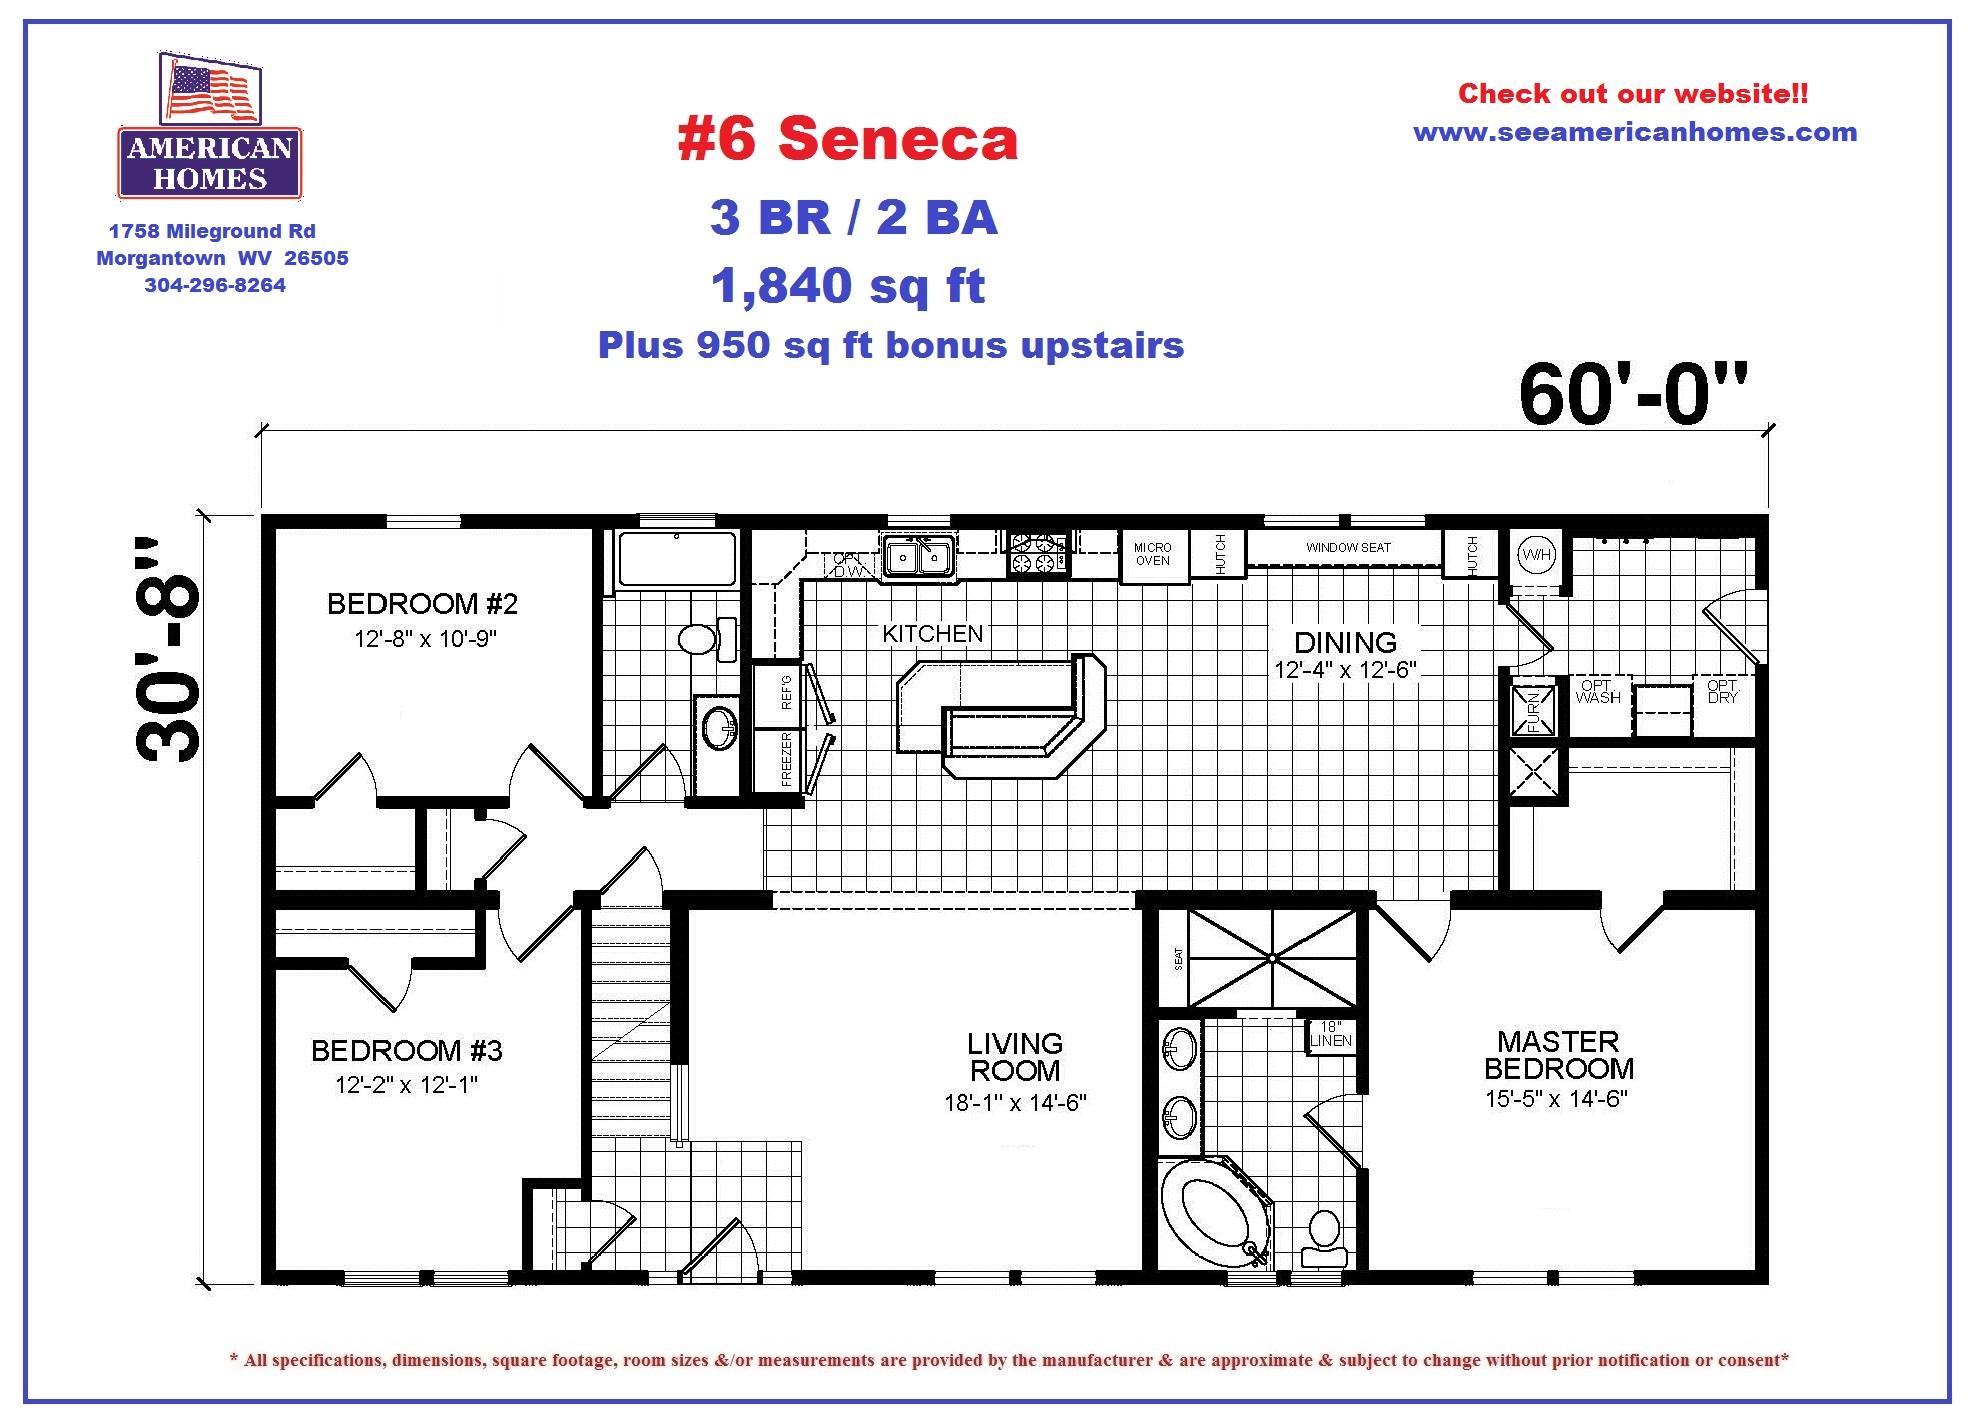 Seneca   American Homes